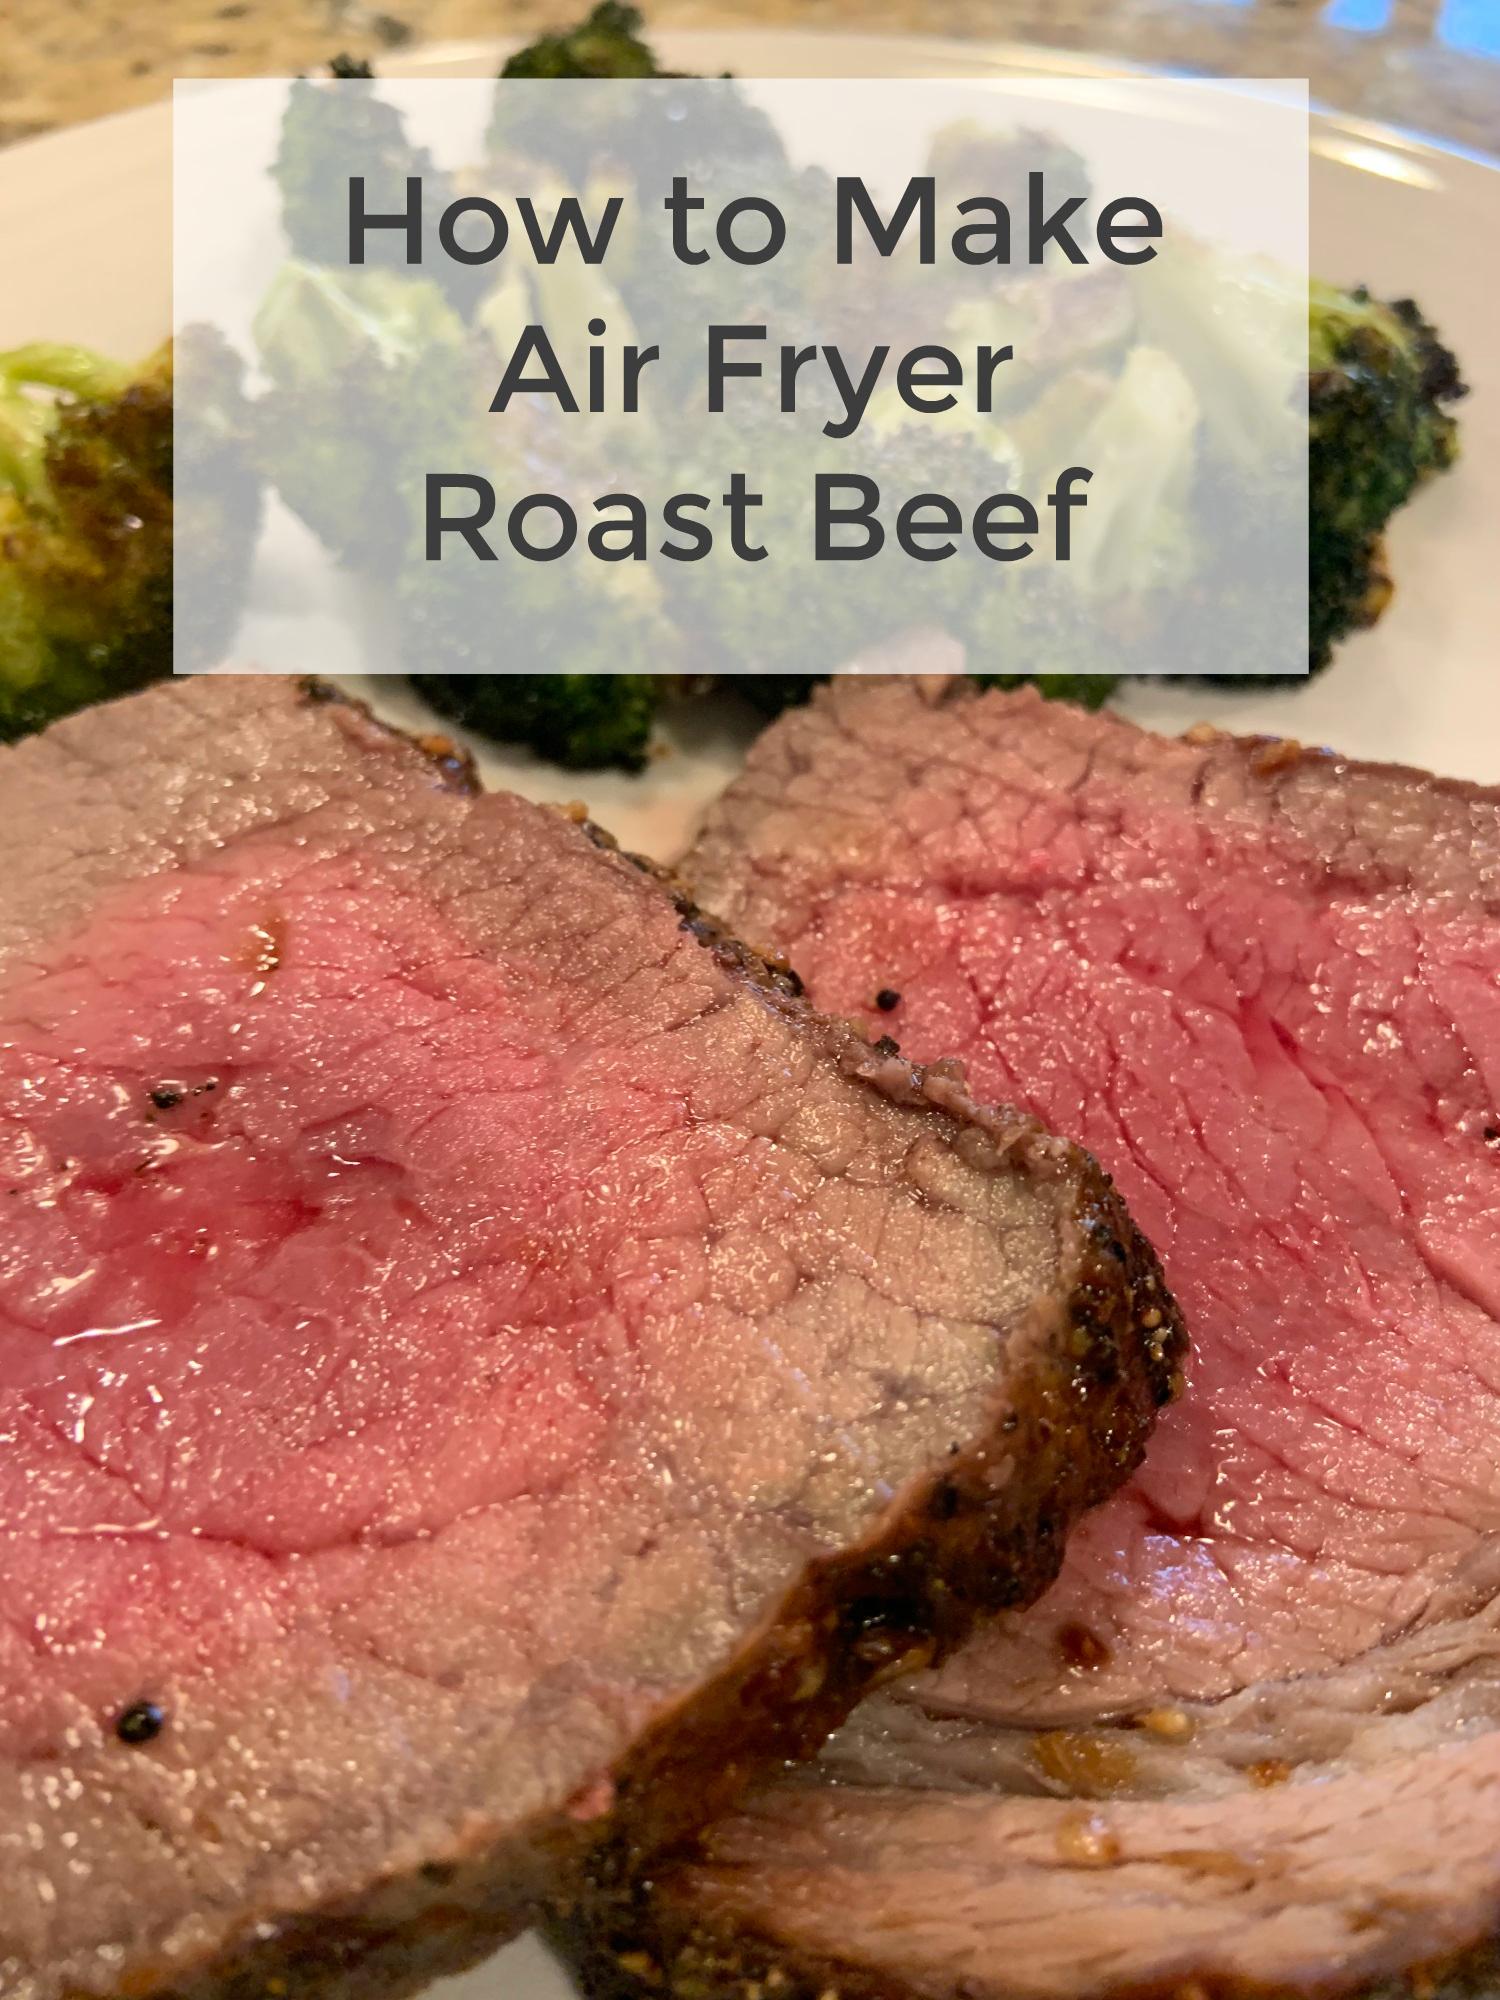 how to make air fryer roast beef